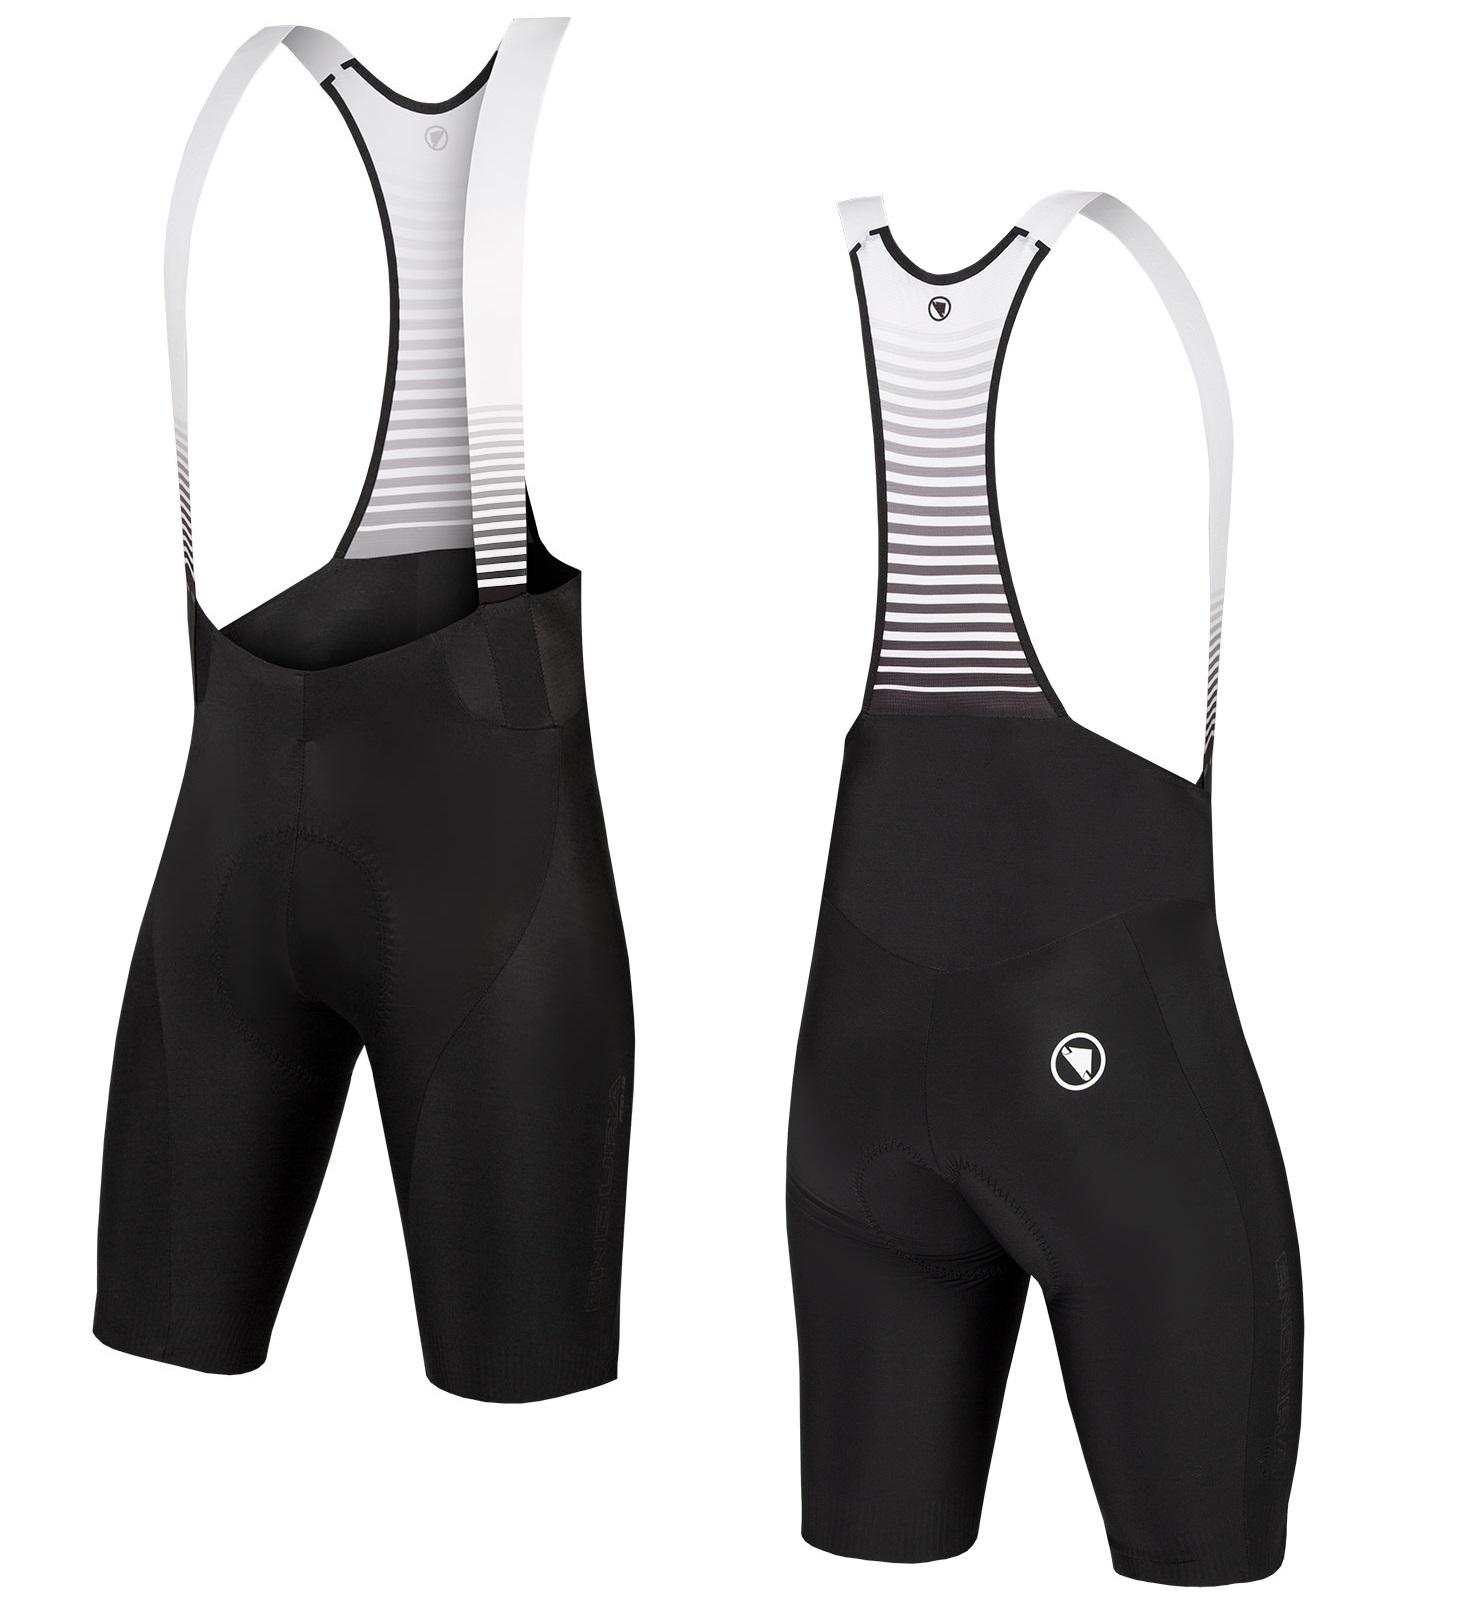 hlače endura pro sl bibshort long leg black